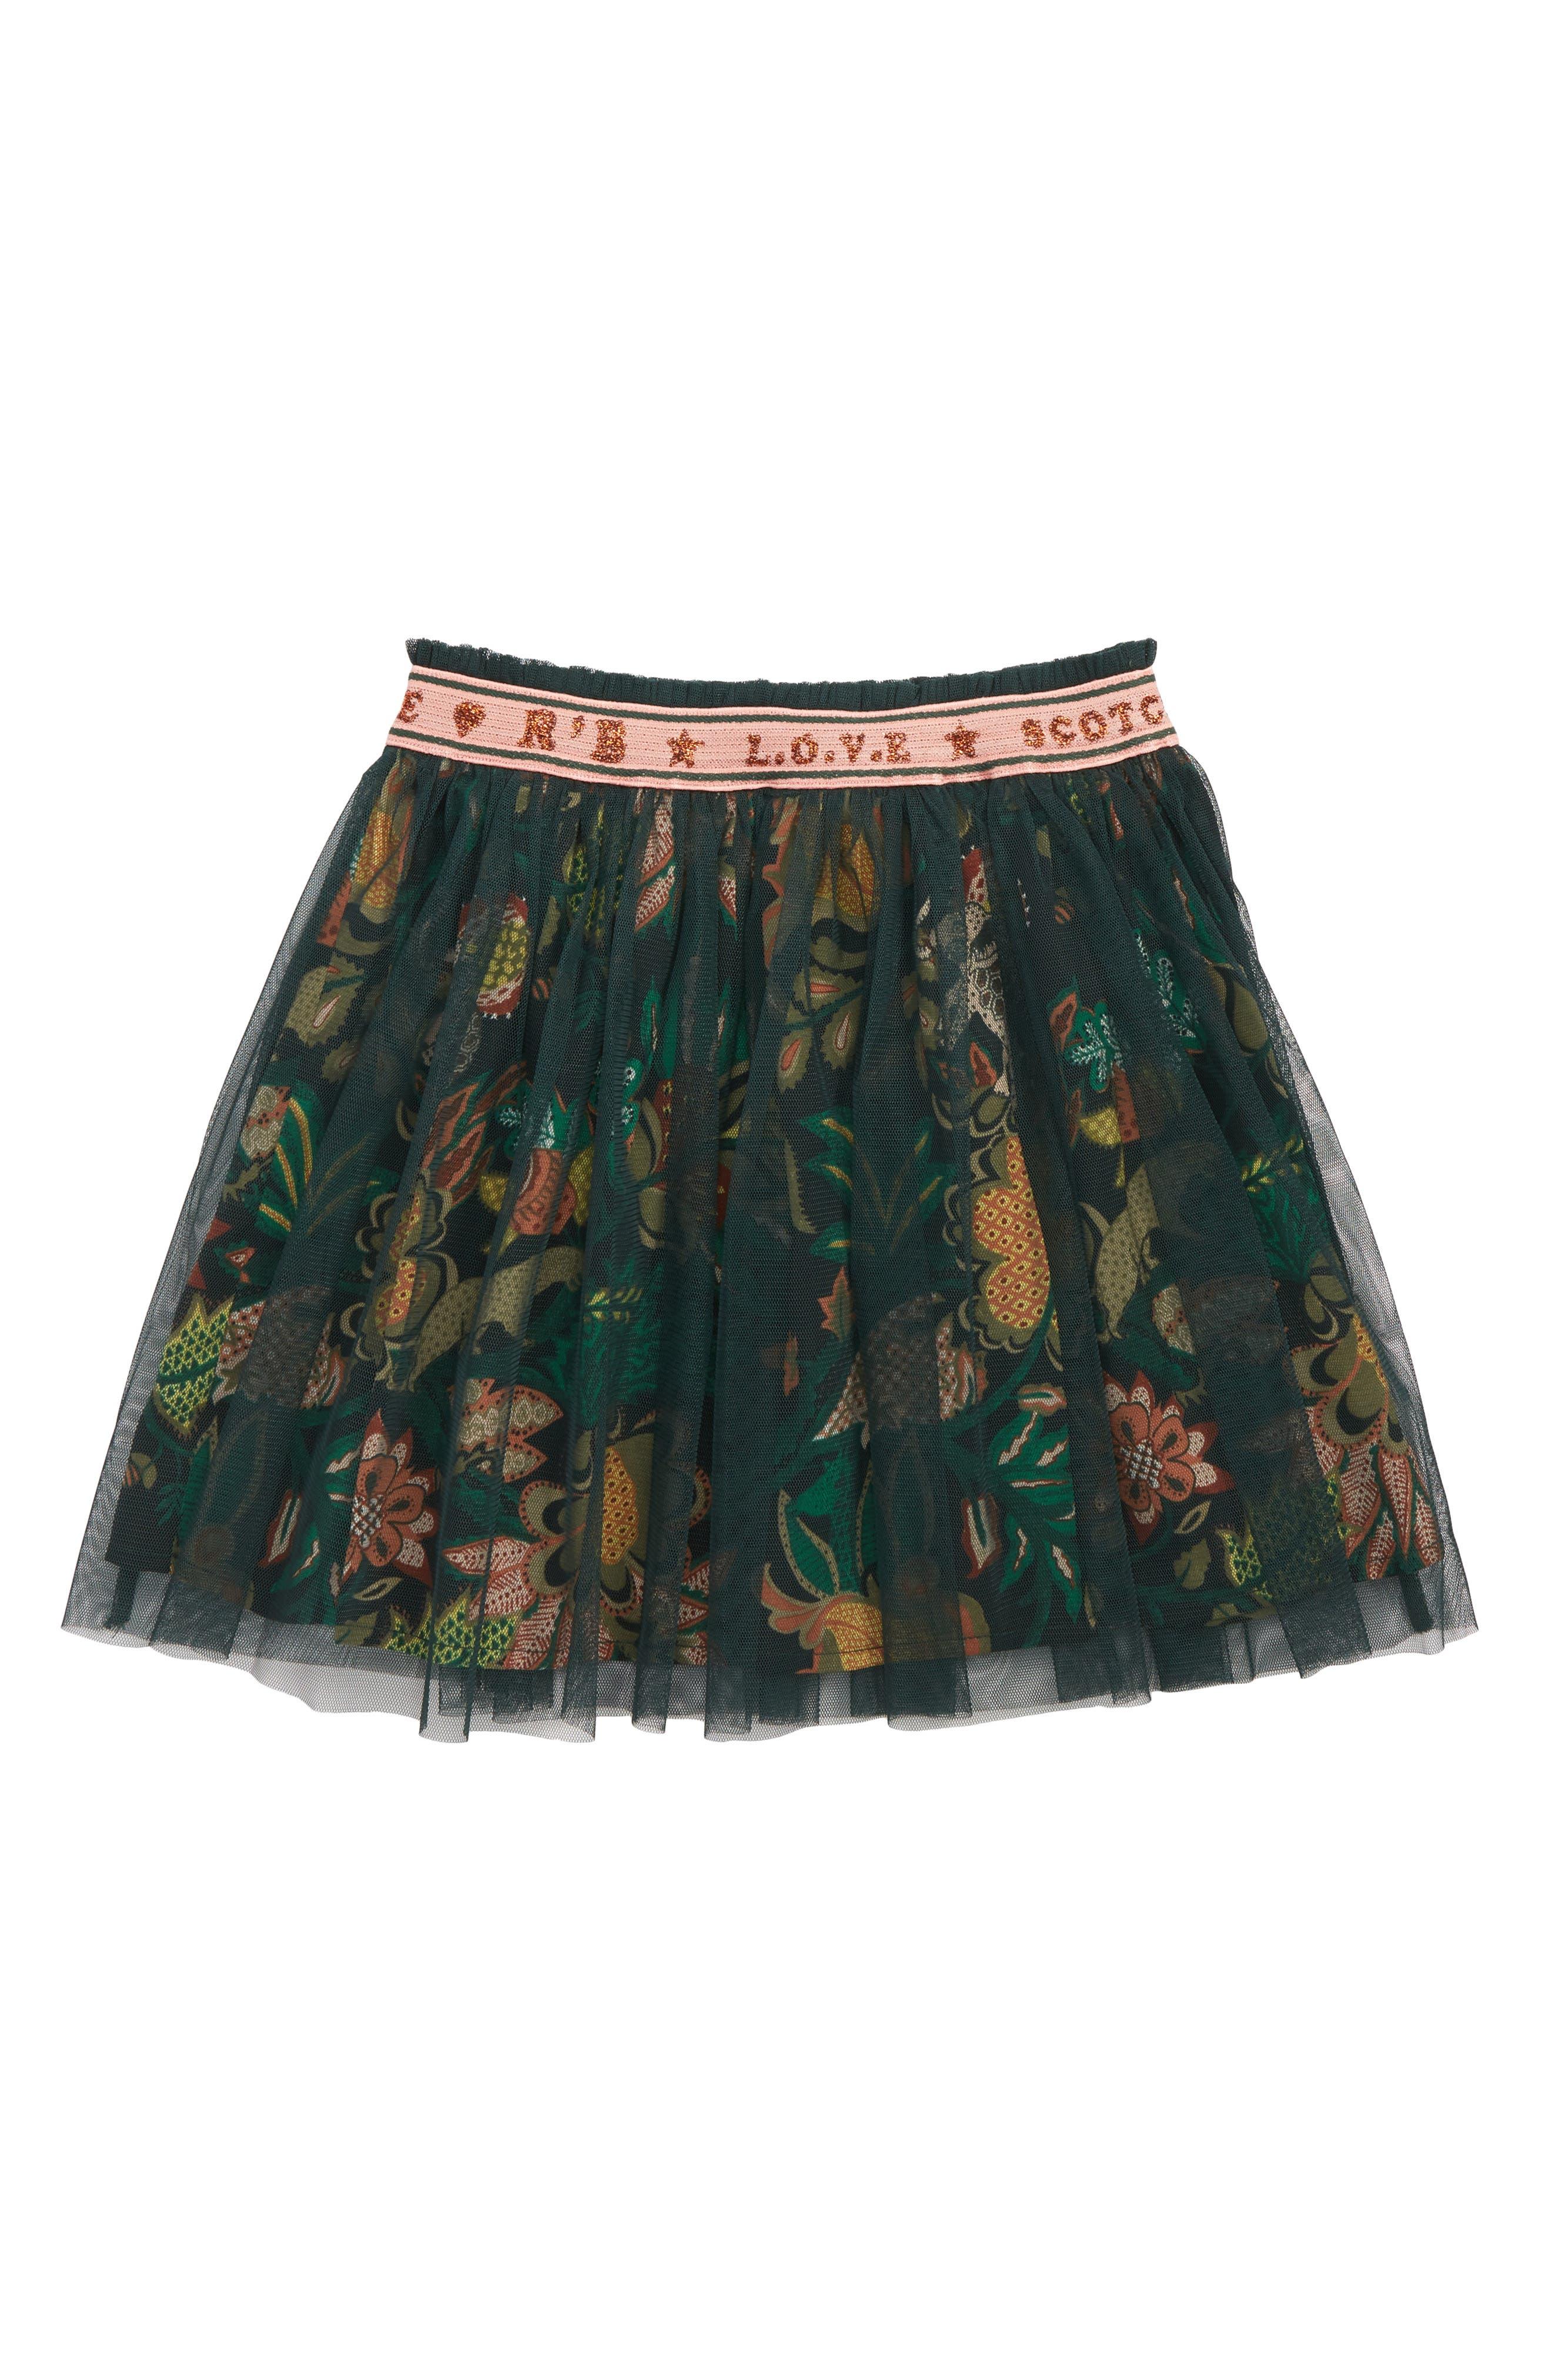 Scotch R'Belle Mesh Tutu Skirt,                             Main thumbnail 1, color,                             BLACK AND GREEN FLORAL